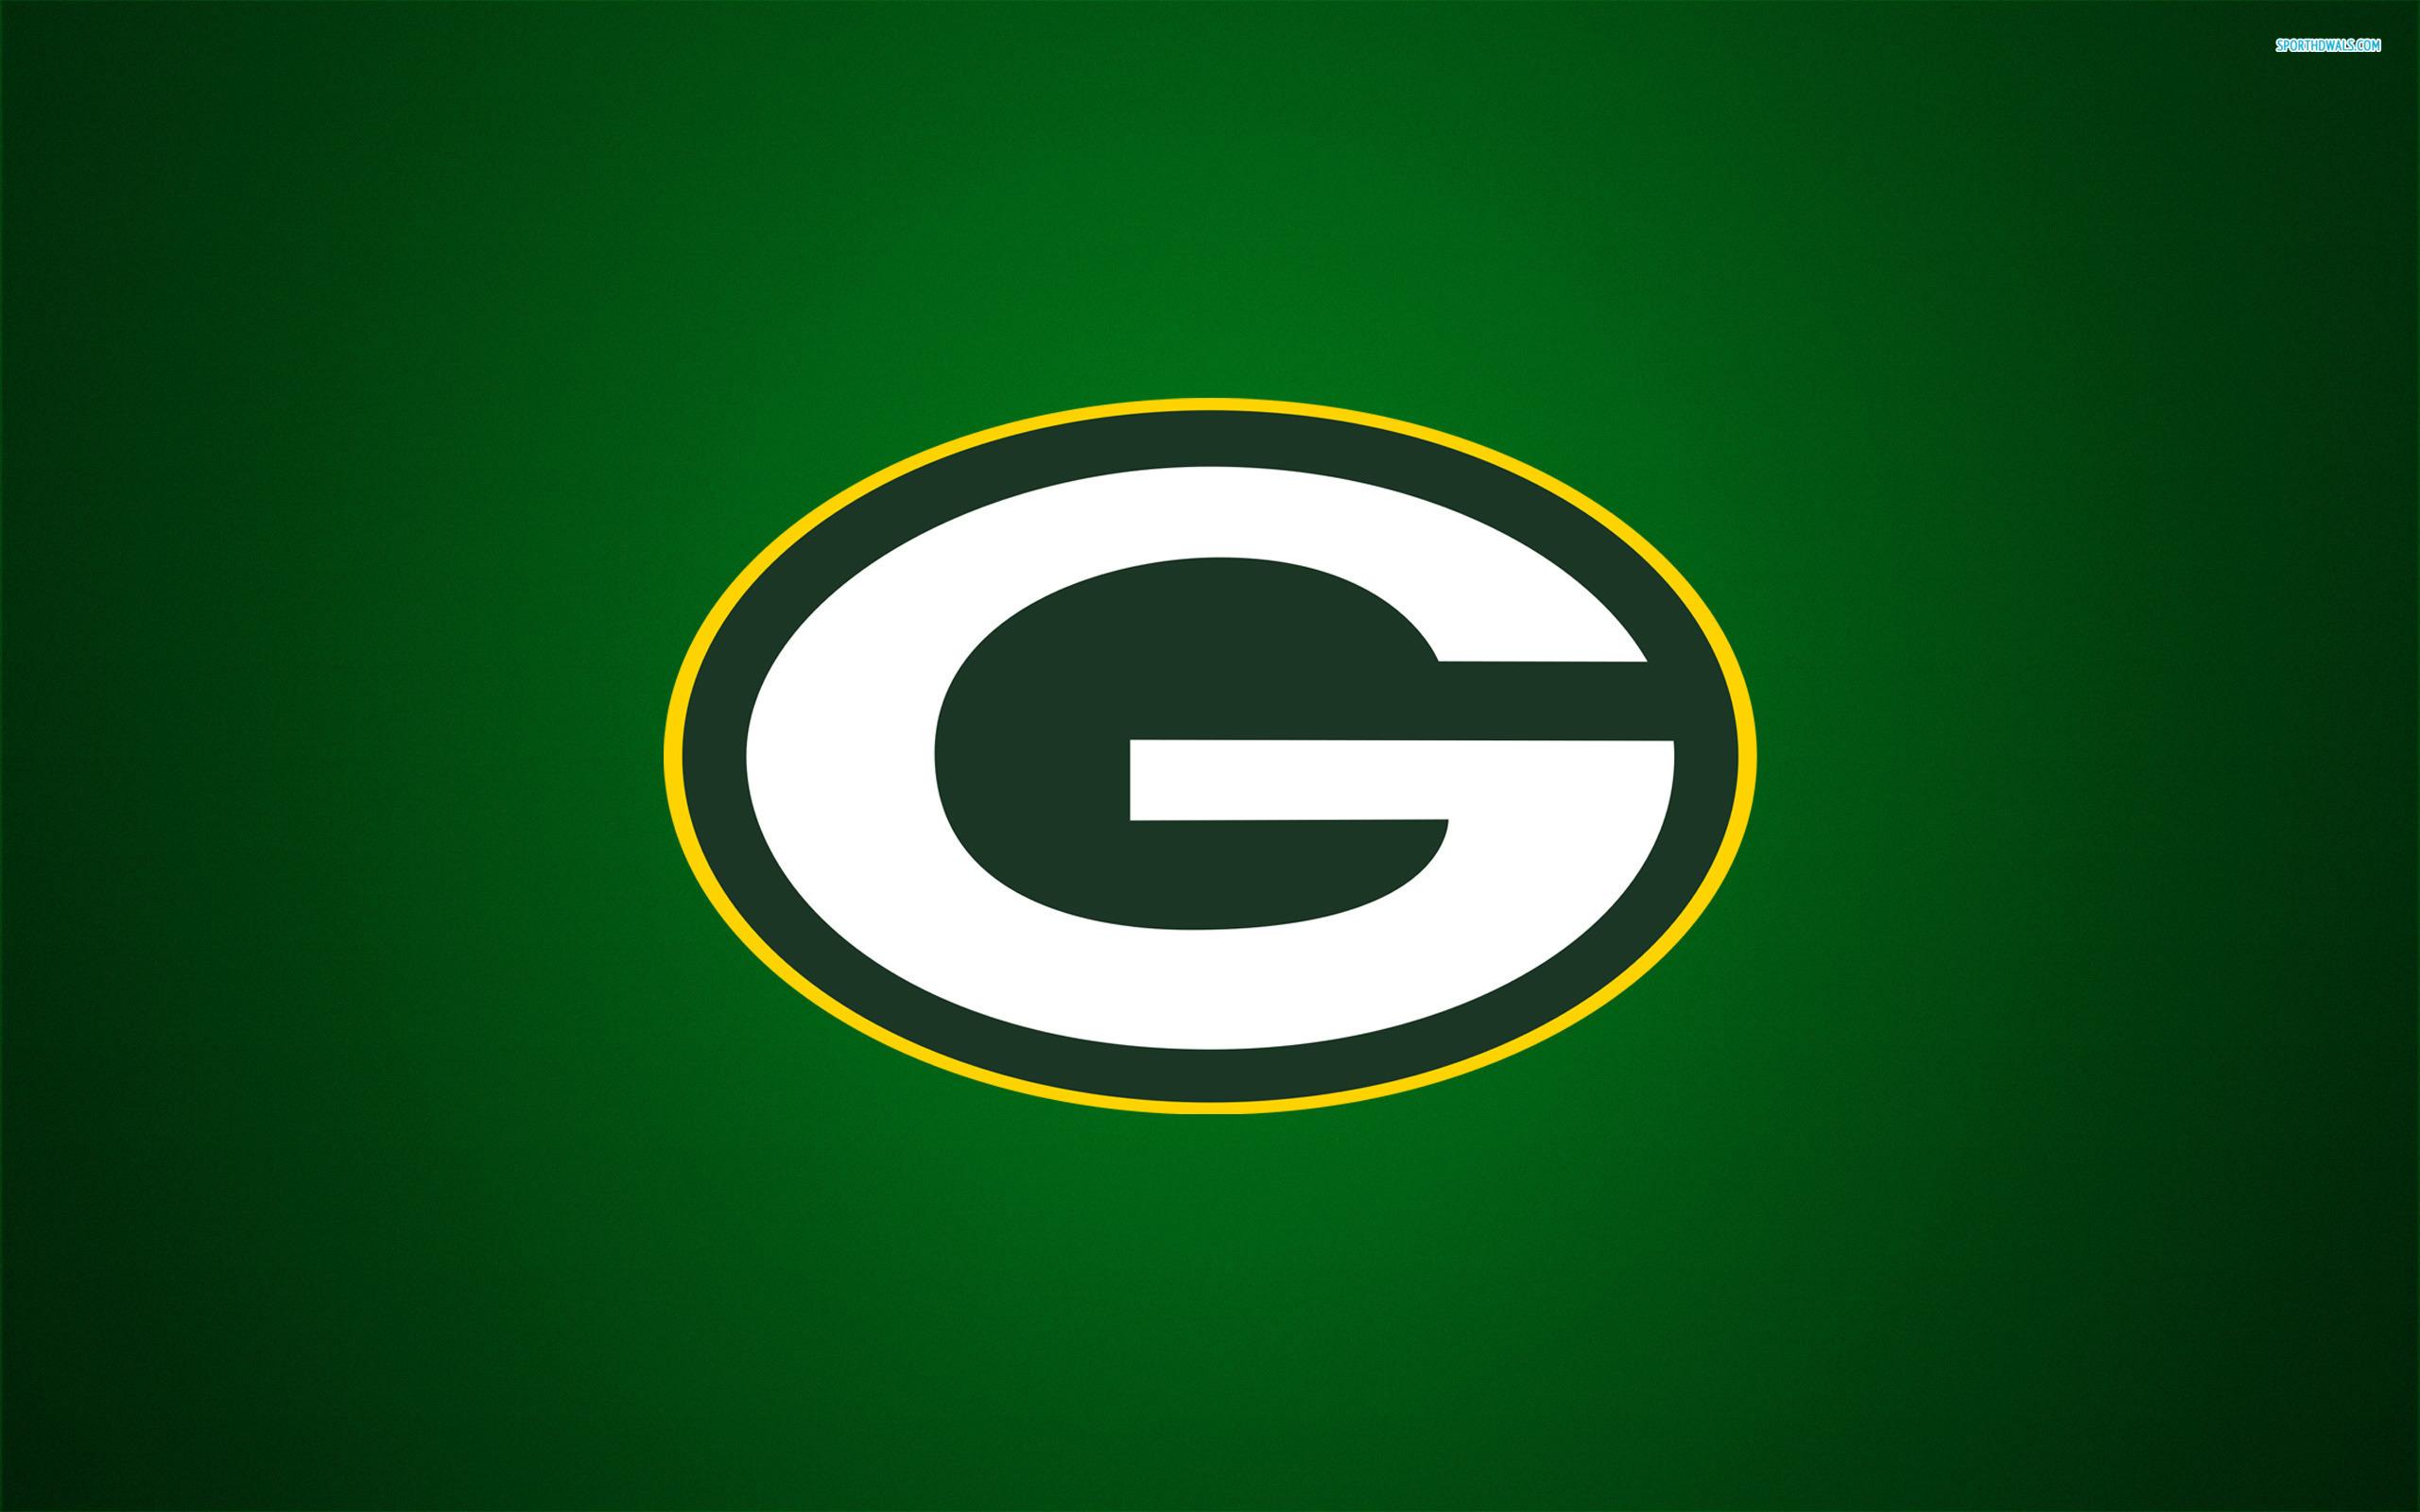 Green Bay Packers wallpaper 2560x1600